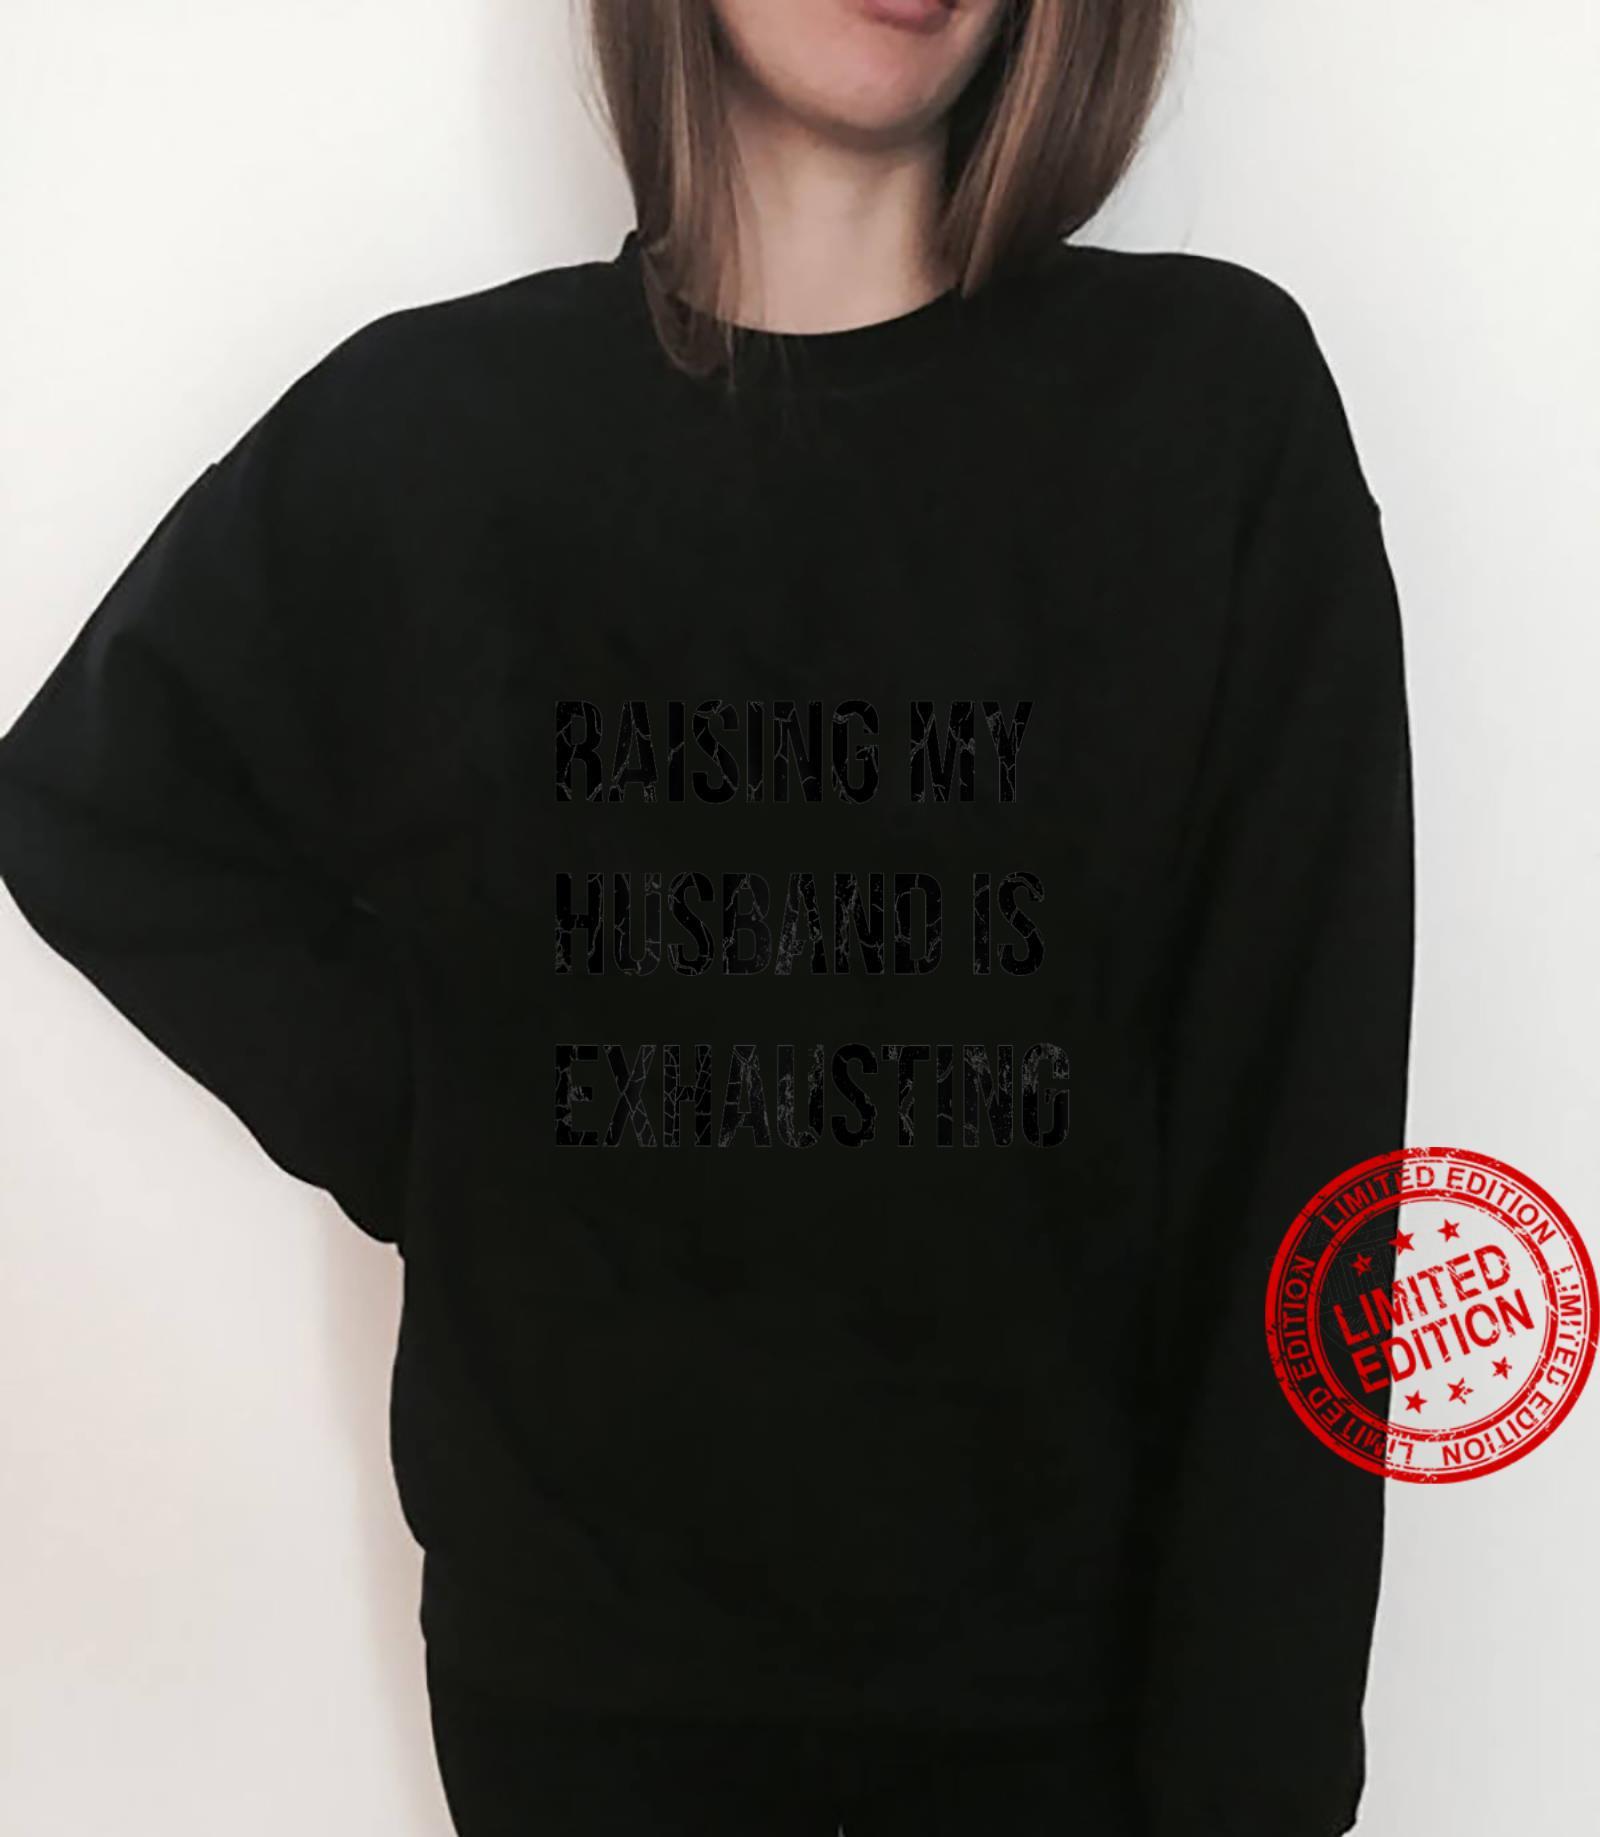 Womens Raising My Husband is Exhausting Shirt sweater